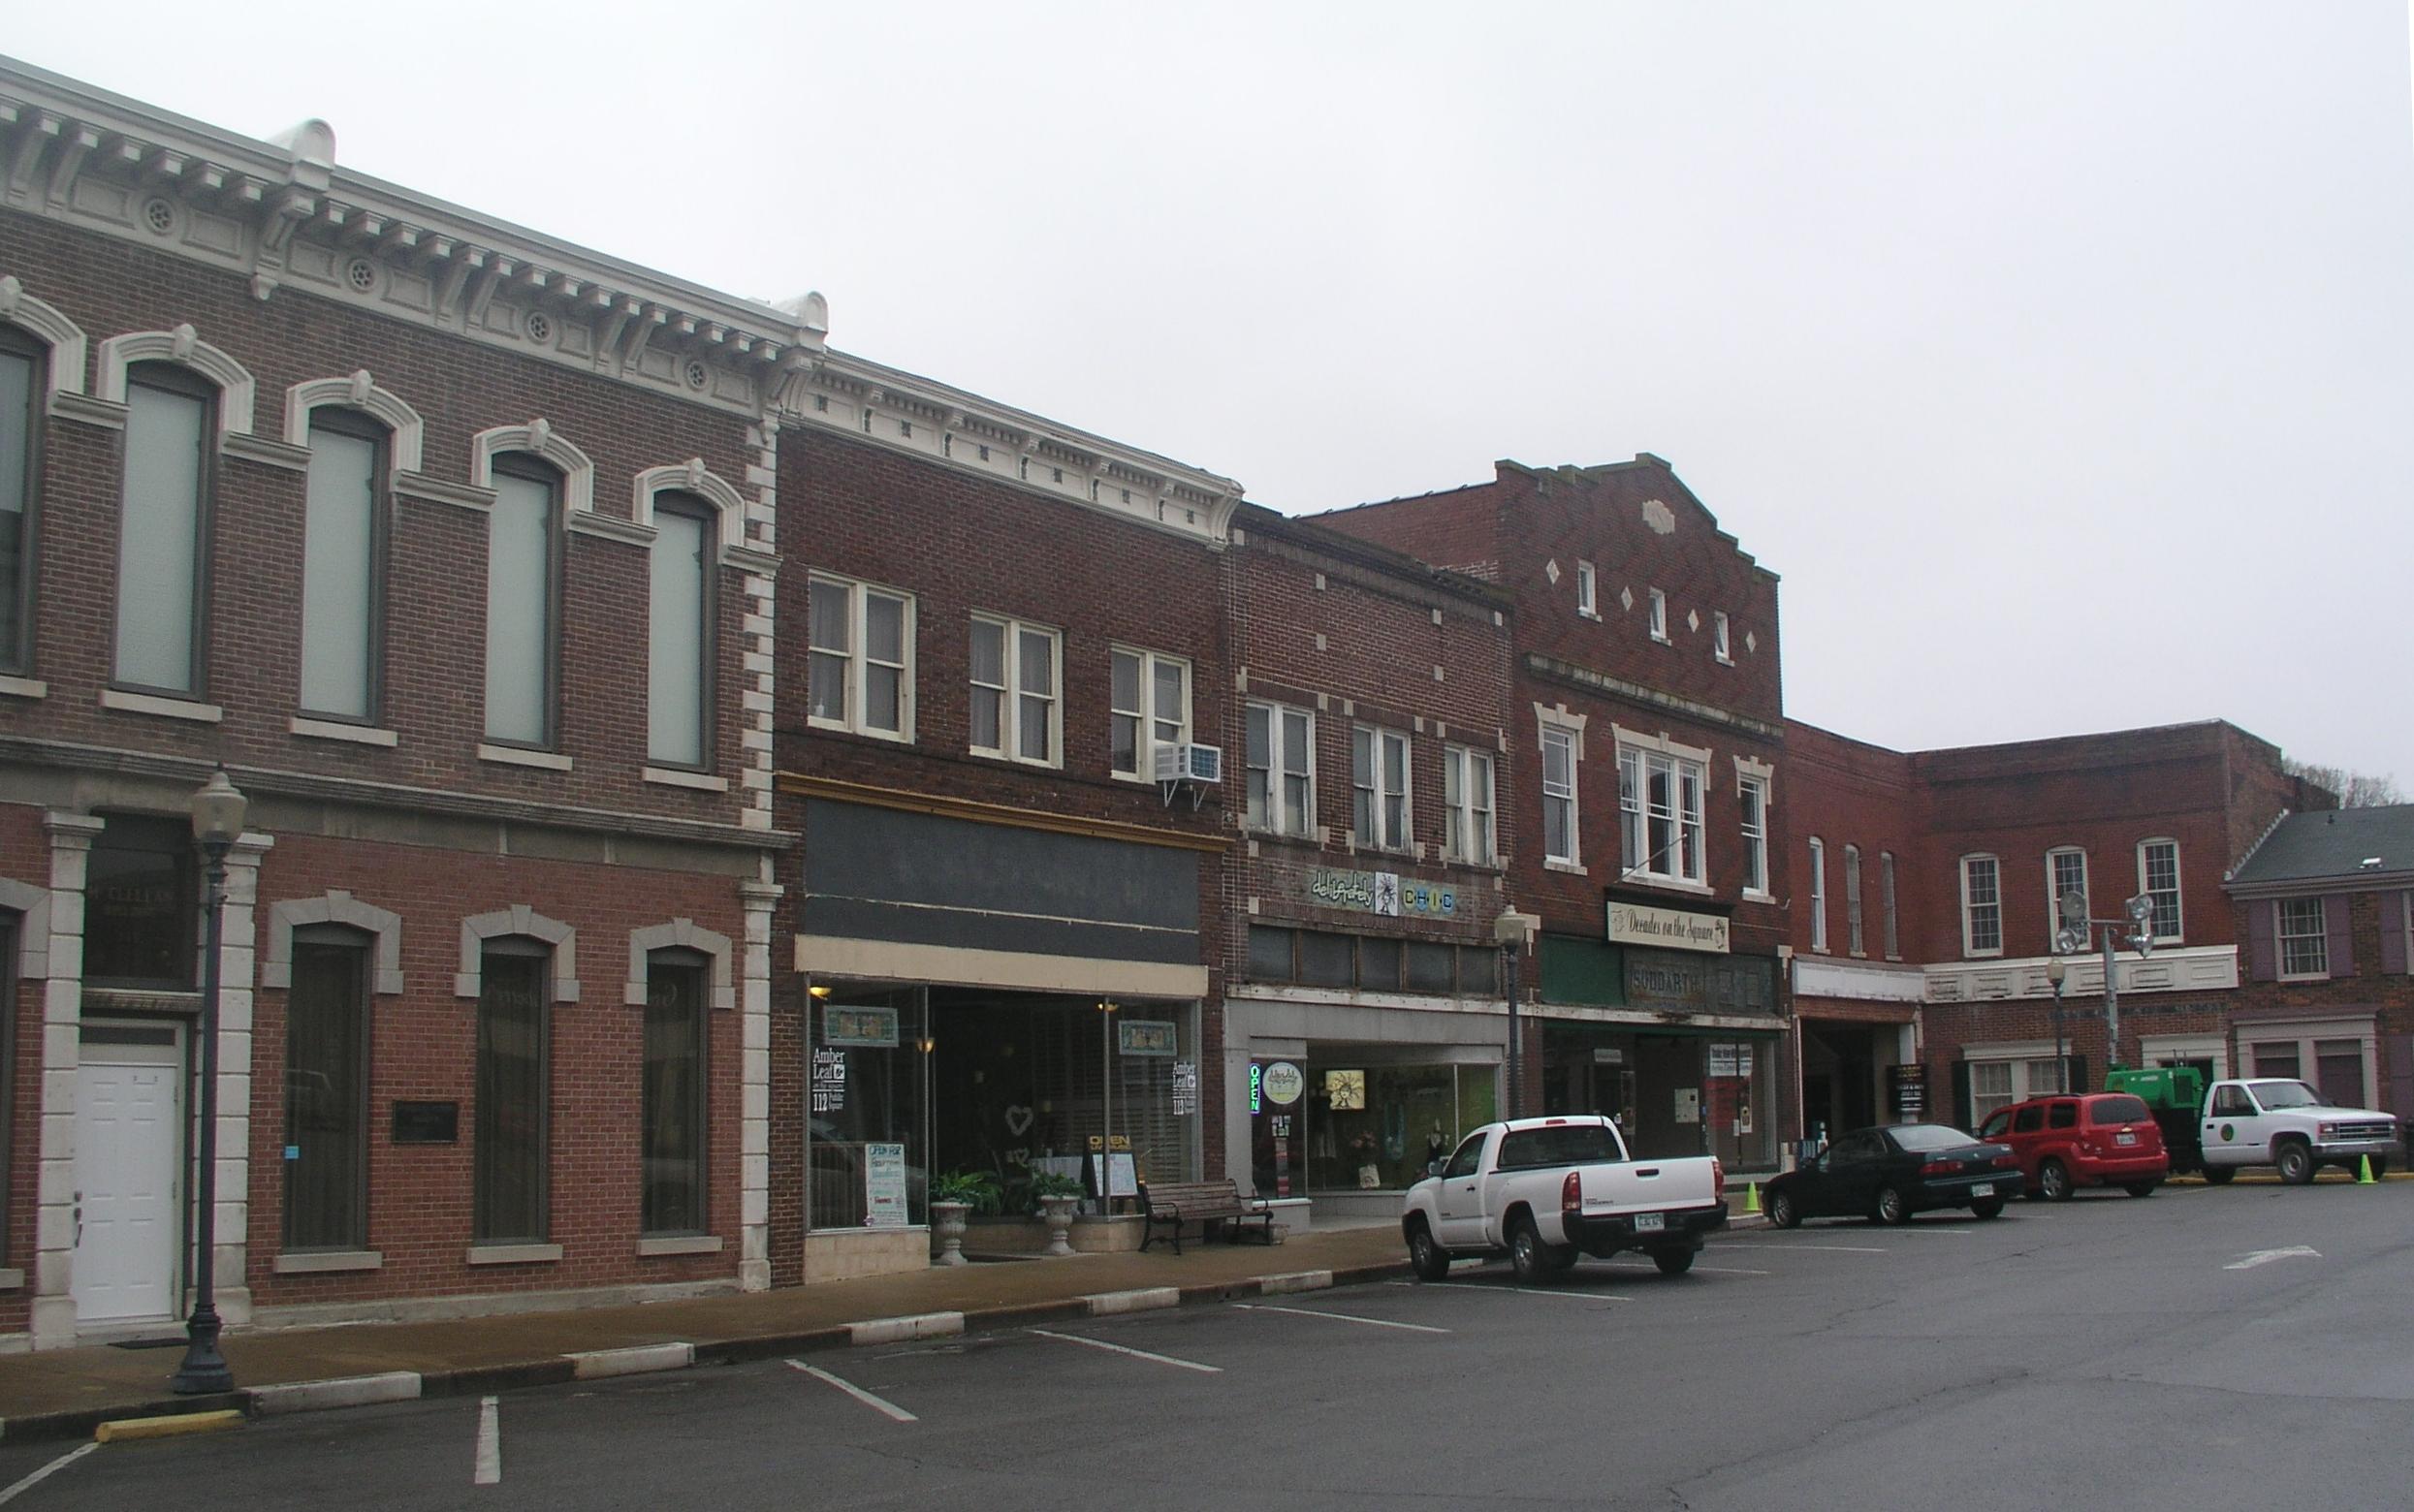 Gallatin Squaregallatin town